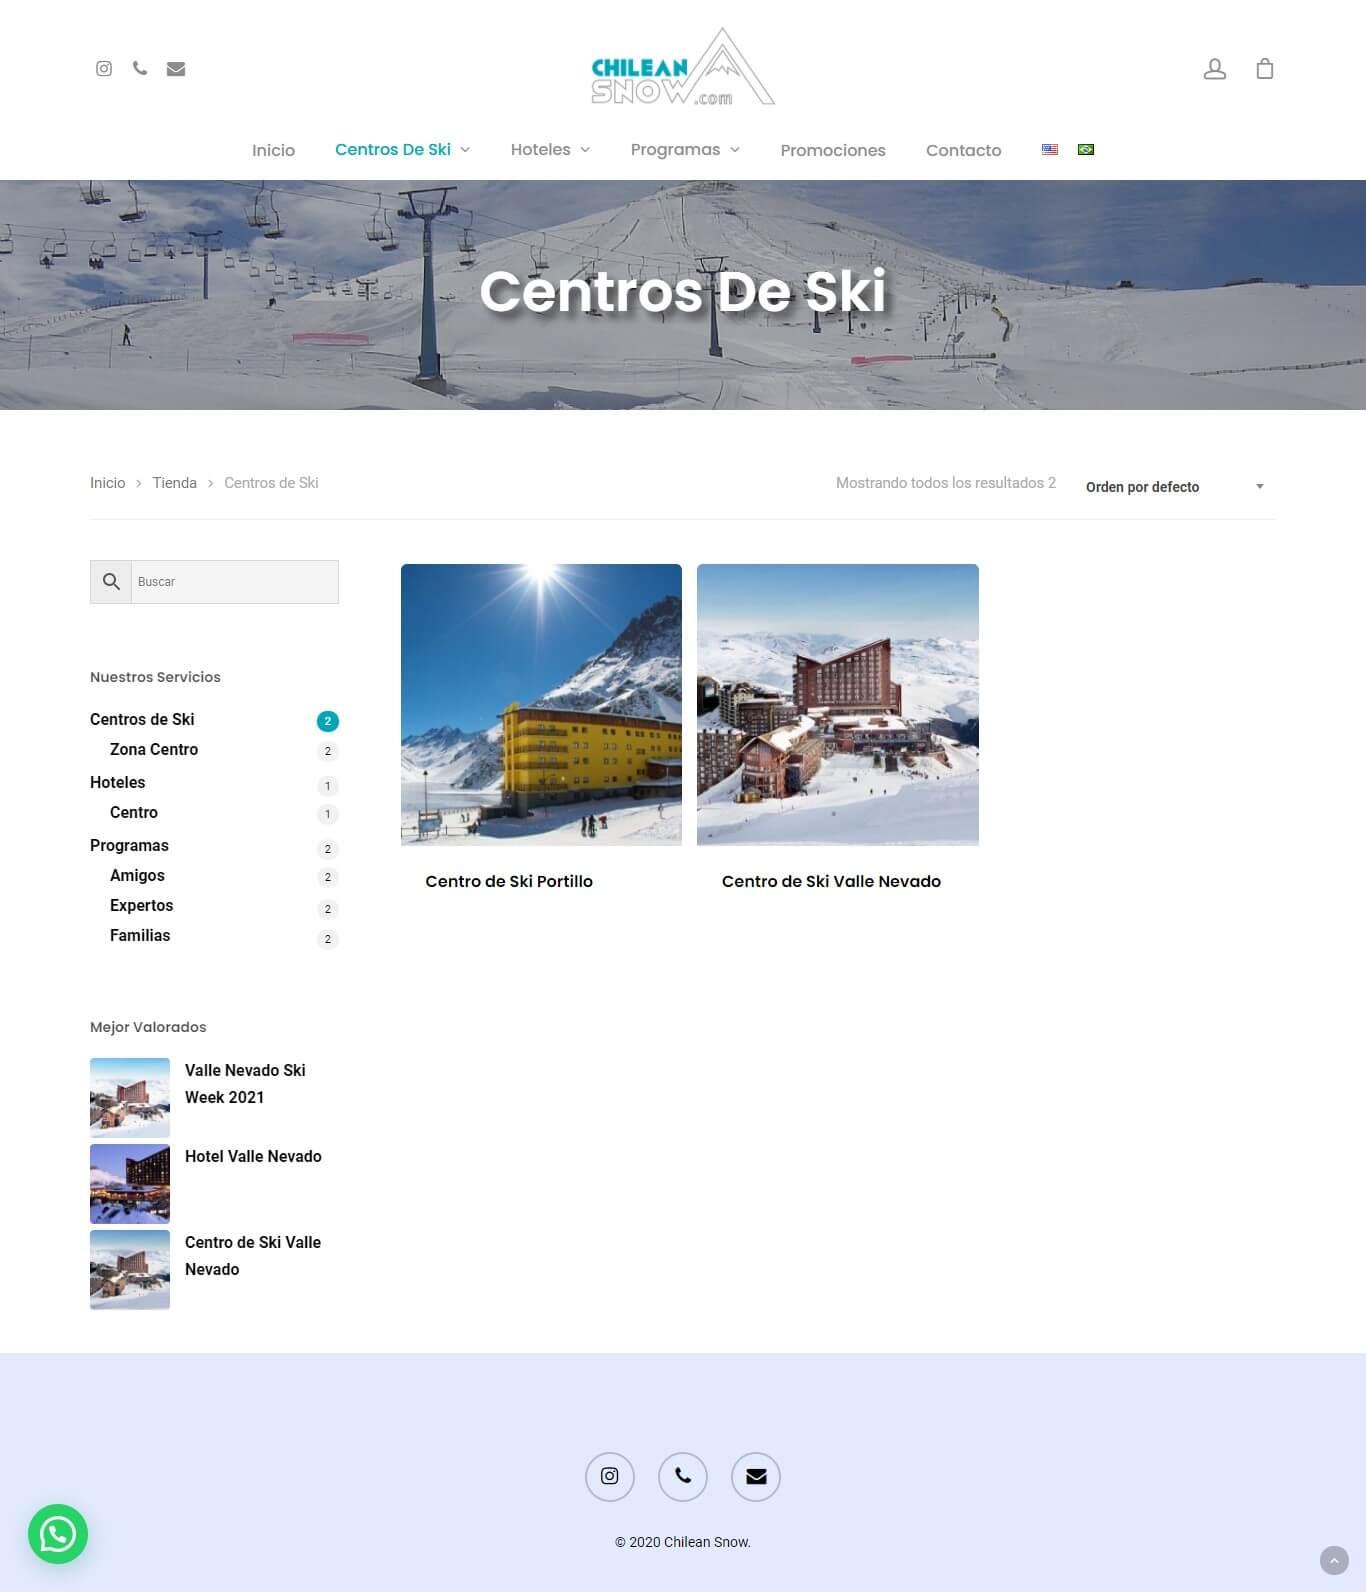 Chilean Snow centros de ski